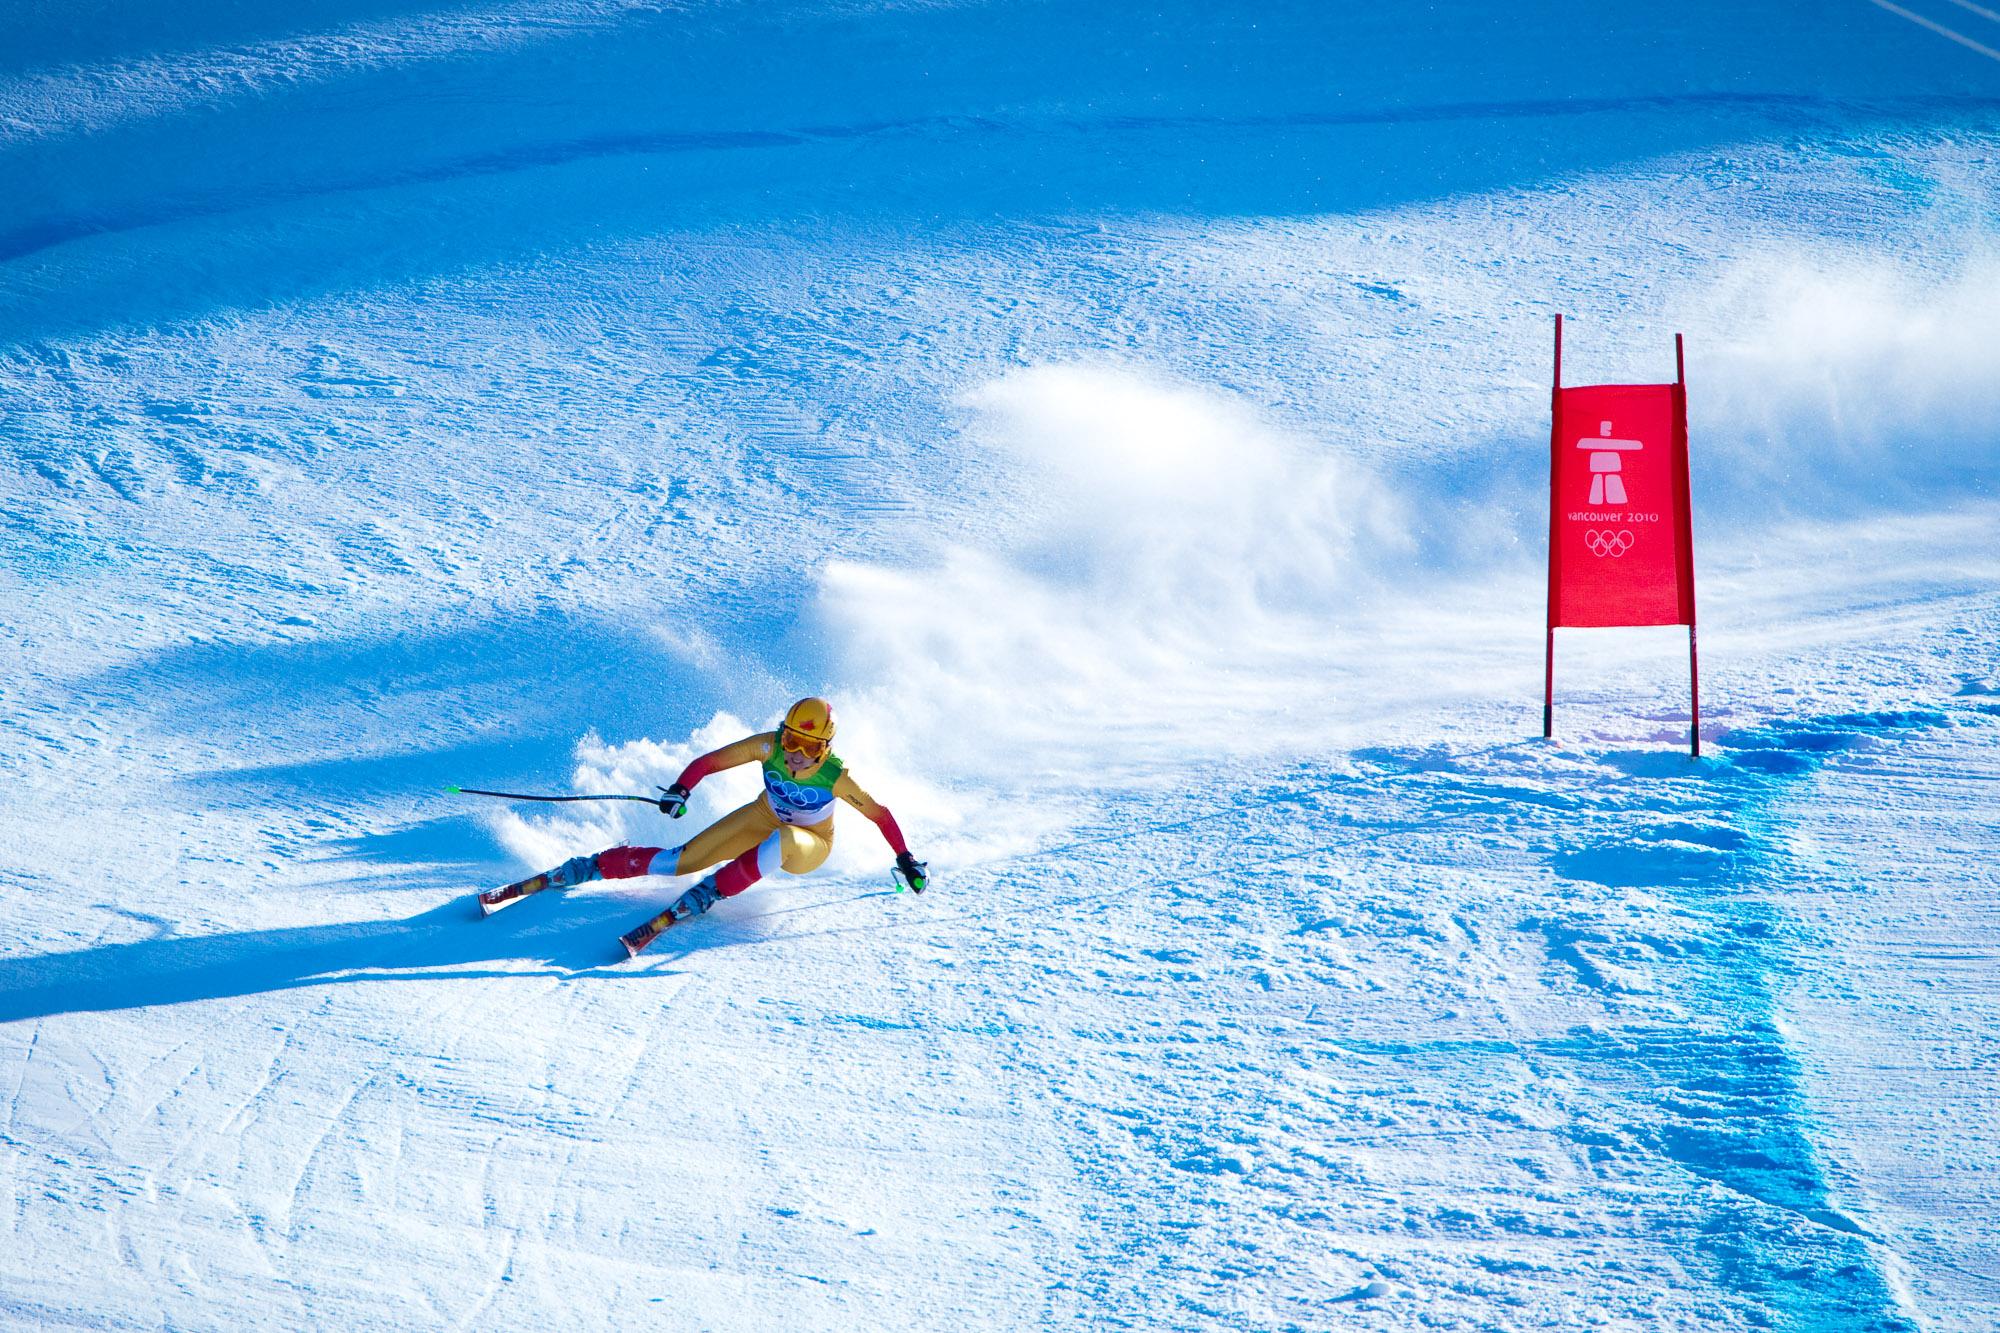 Justa-Jeskova-sport-events-photography-JJ006681.jpg